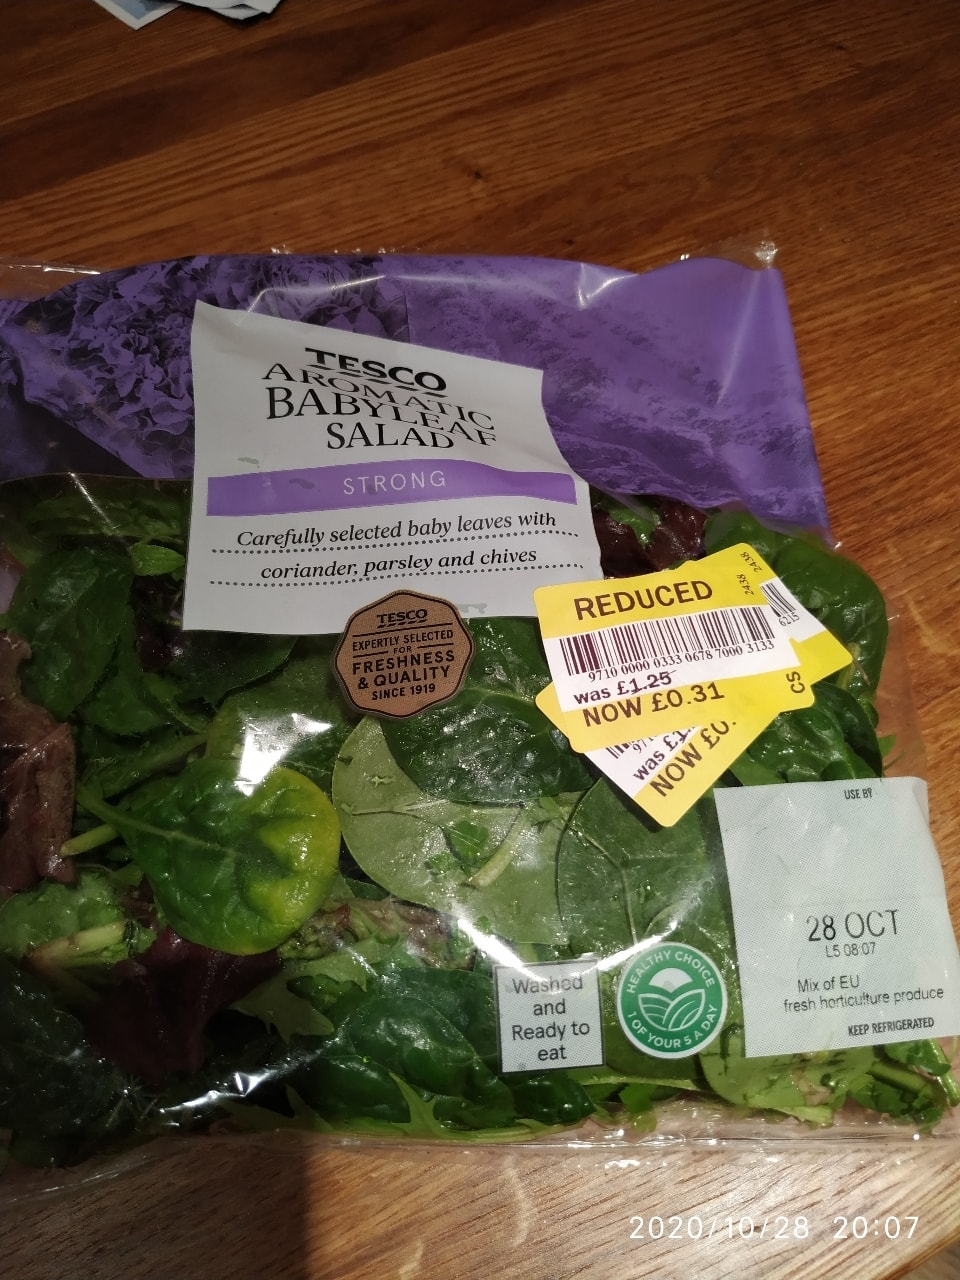 Tesco aromatic baby leaf salad